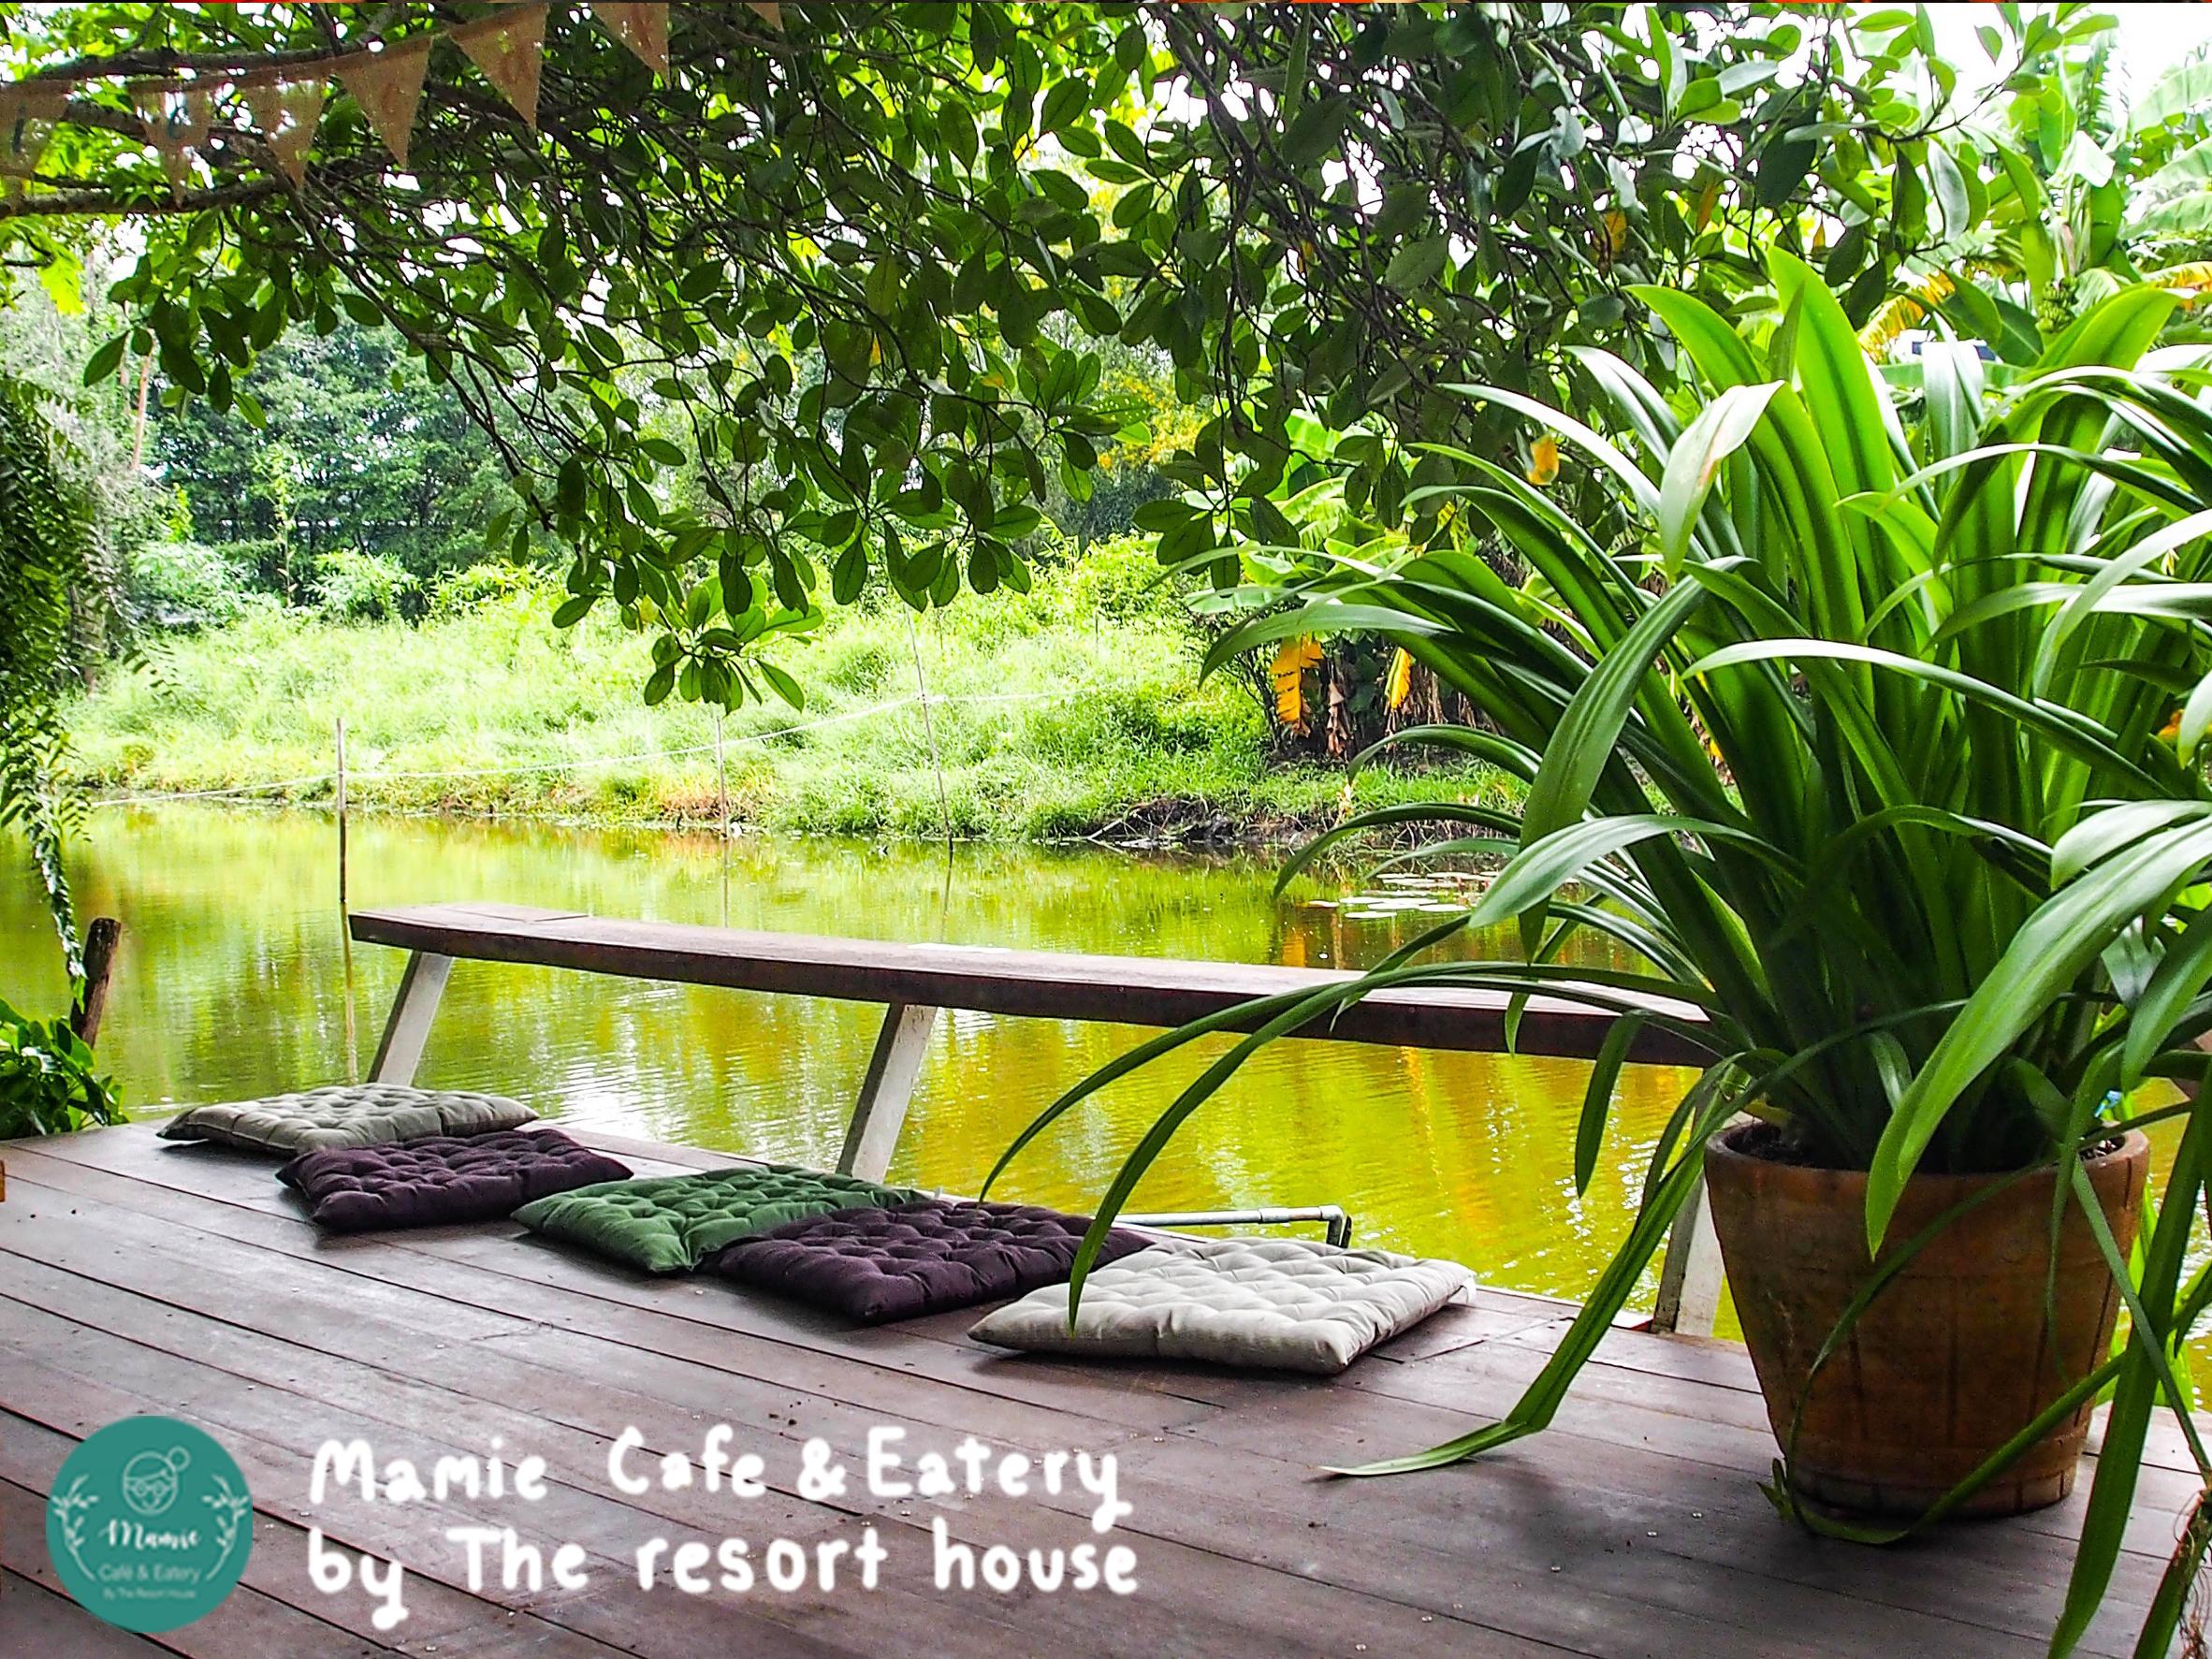 Mamie Café & Eatery คาเฟ่วิวดี ที่แจ้งเกิดกลางวิกฤต